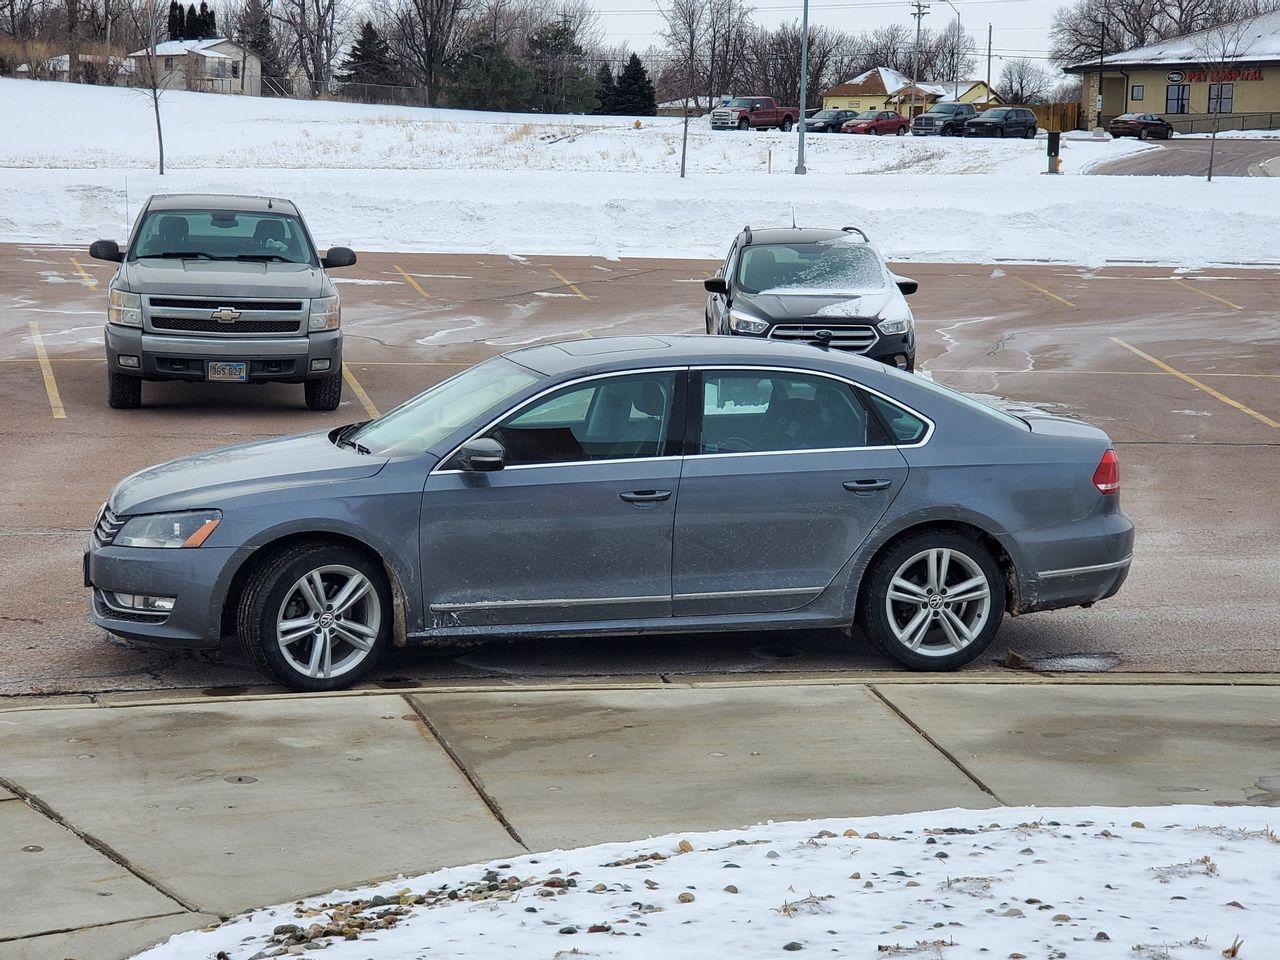 2014 Volkswagen Passat 2.0L TDI SEL Premium | Brandon, SD, Platinum Gray Metallic (Gray), Front Wheel